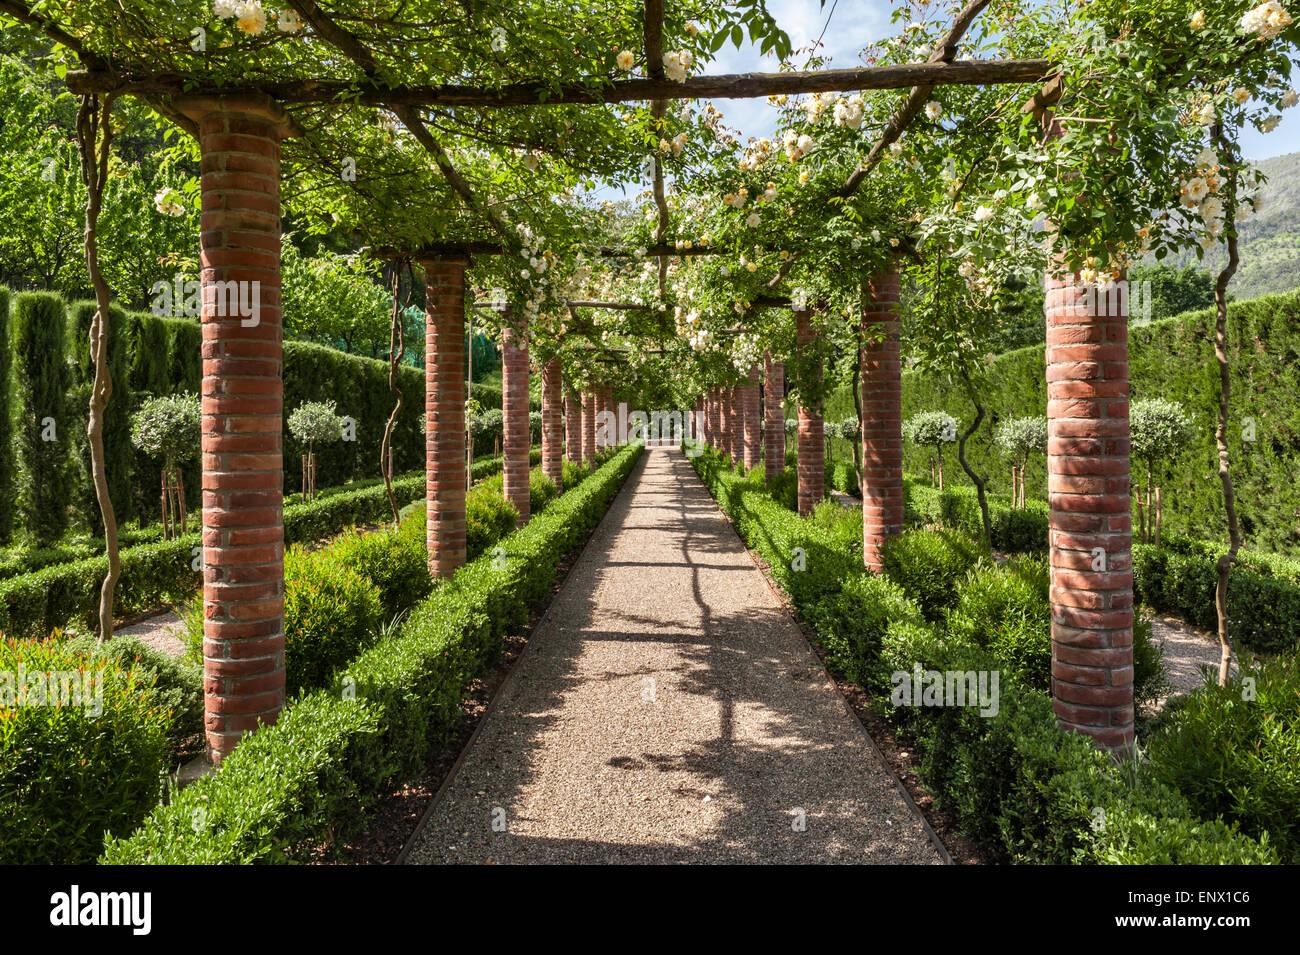 Image Gallery italian garden pergolas